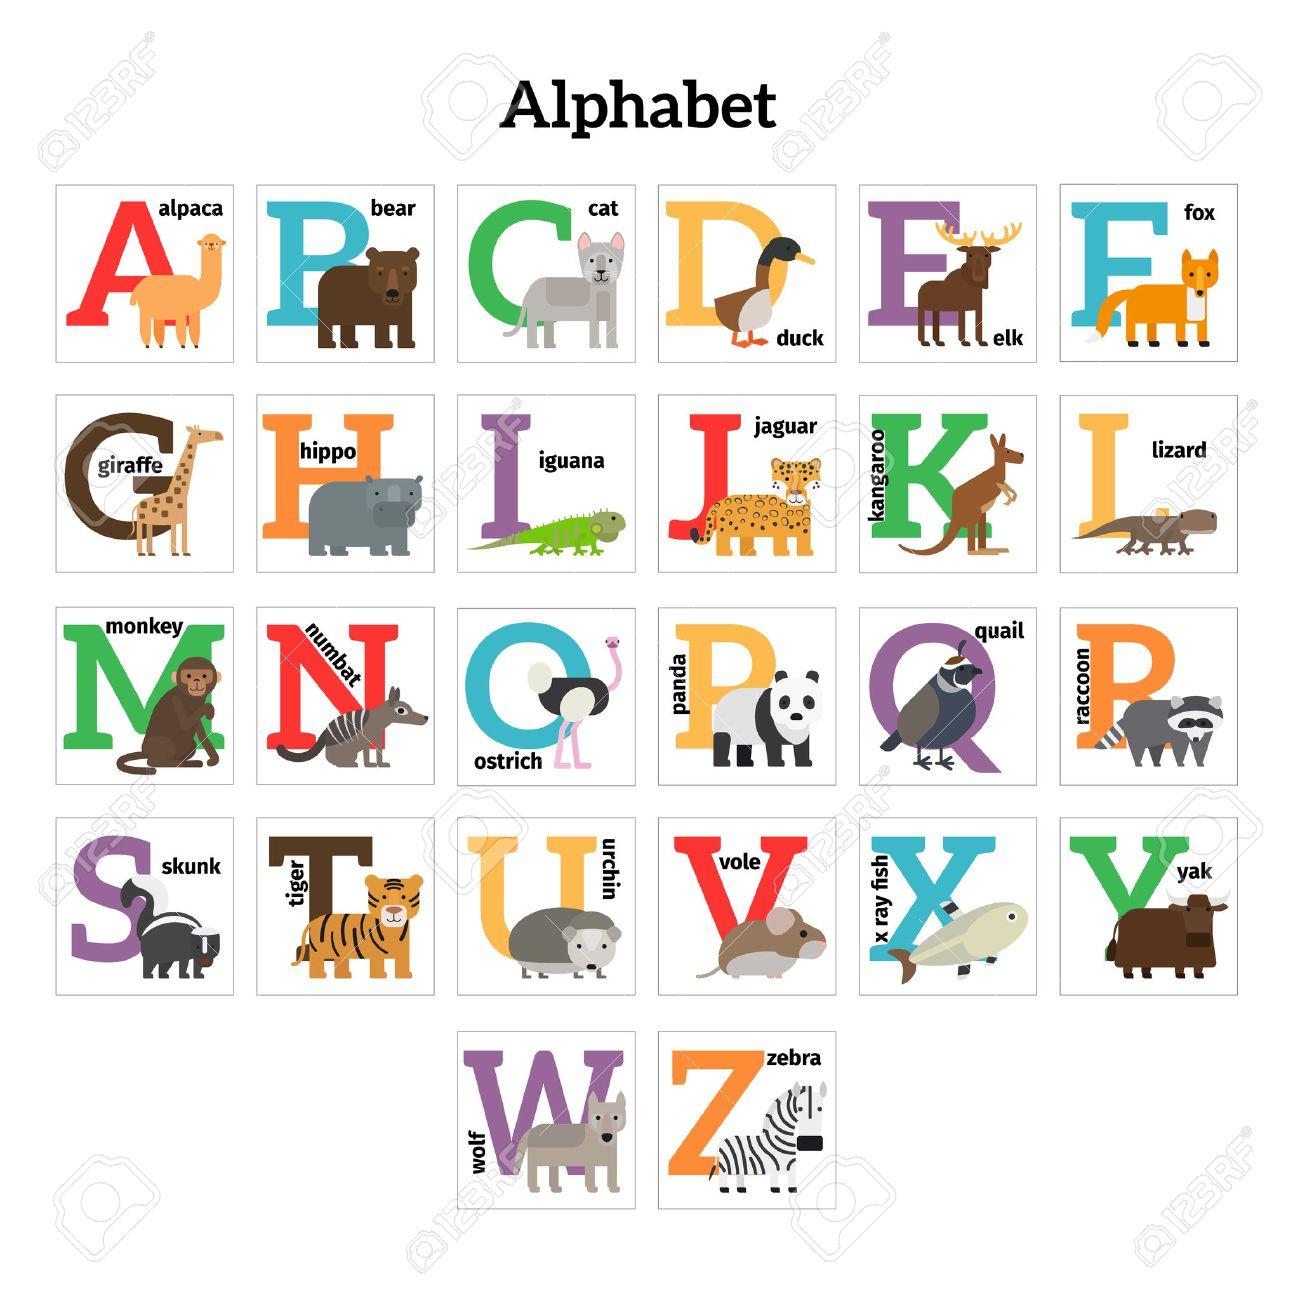 Printables Alphabet For Preschoolers worksheet preschool alphabet mikyu free english animals zoo kids education vector illustration stock 48756232